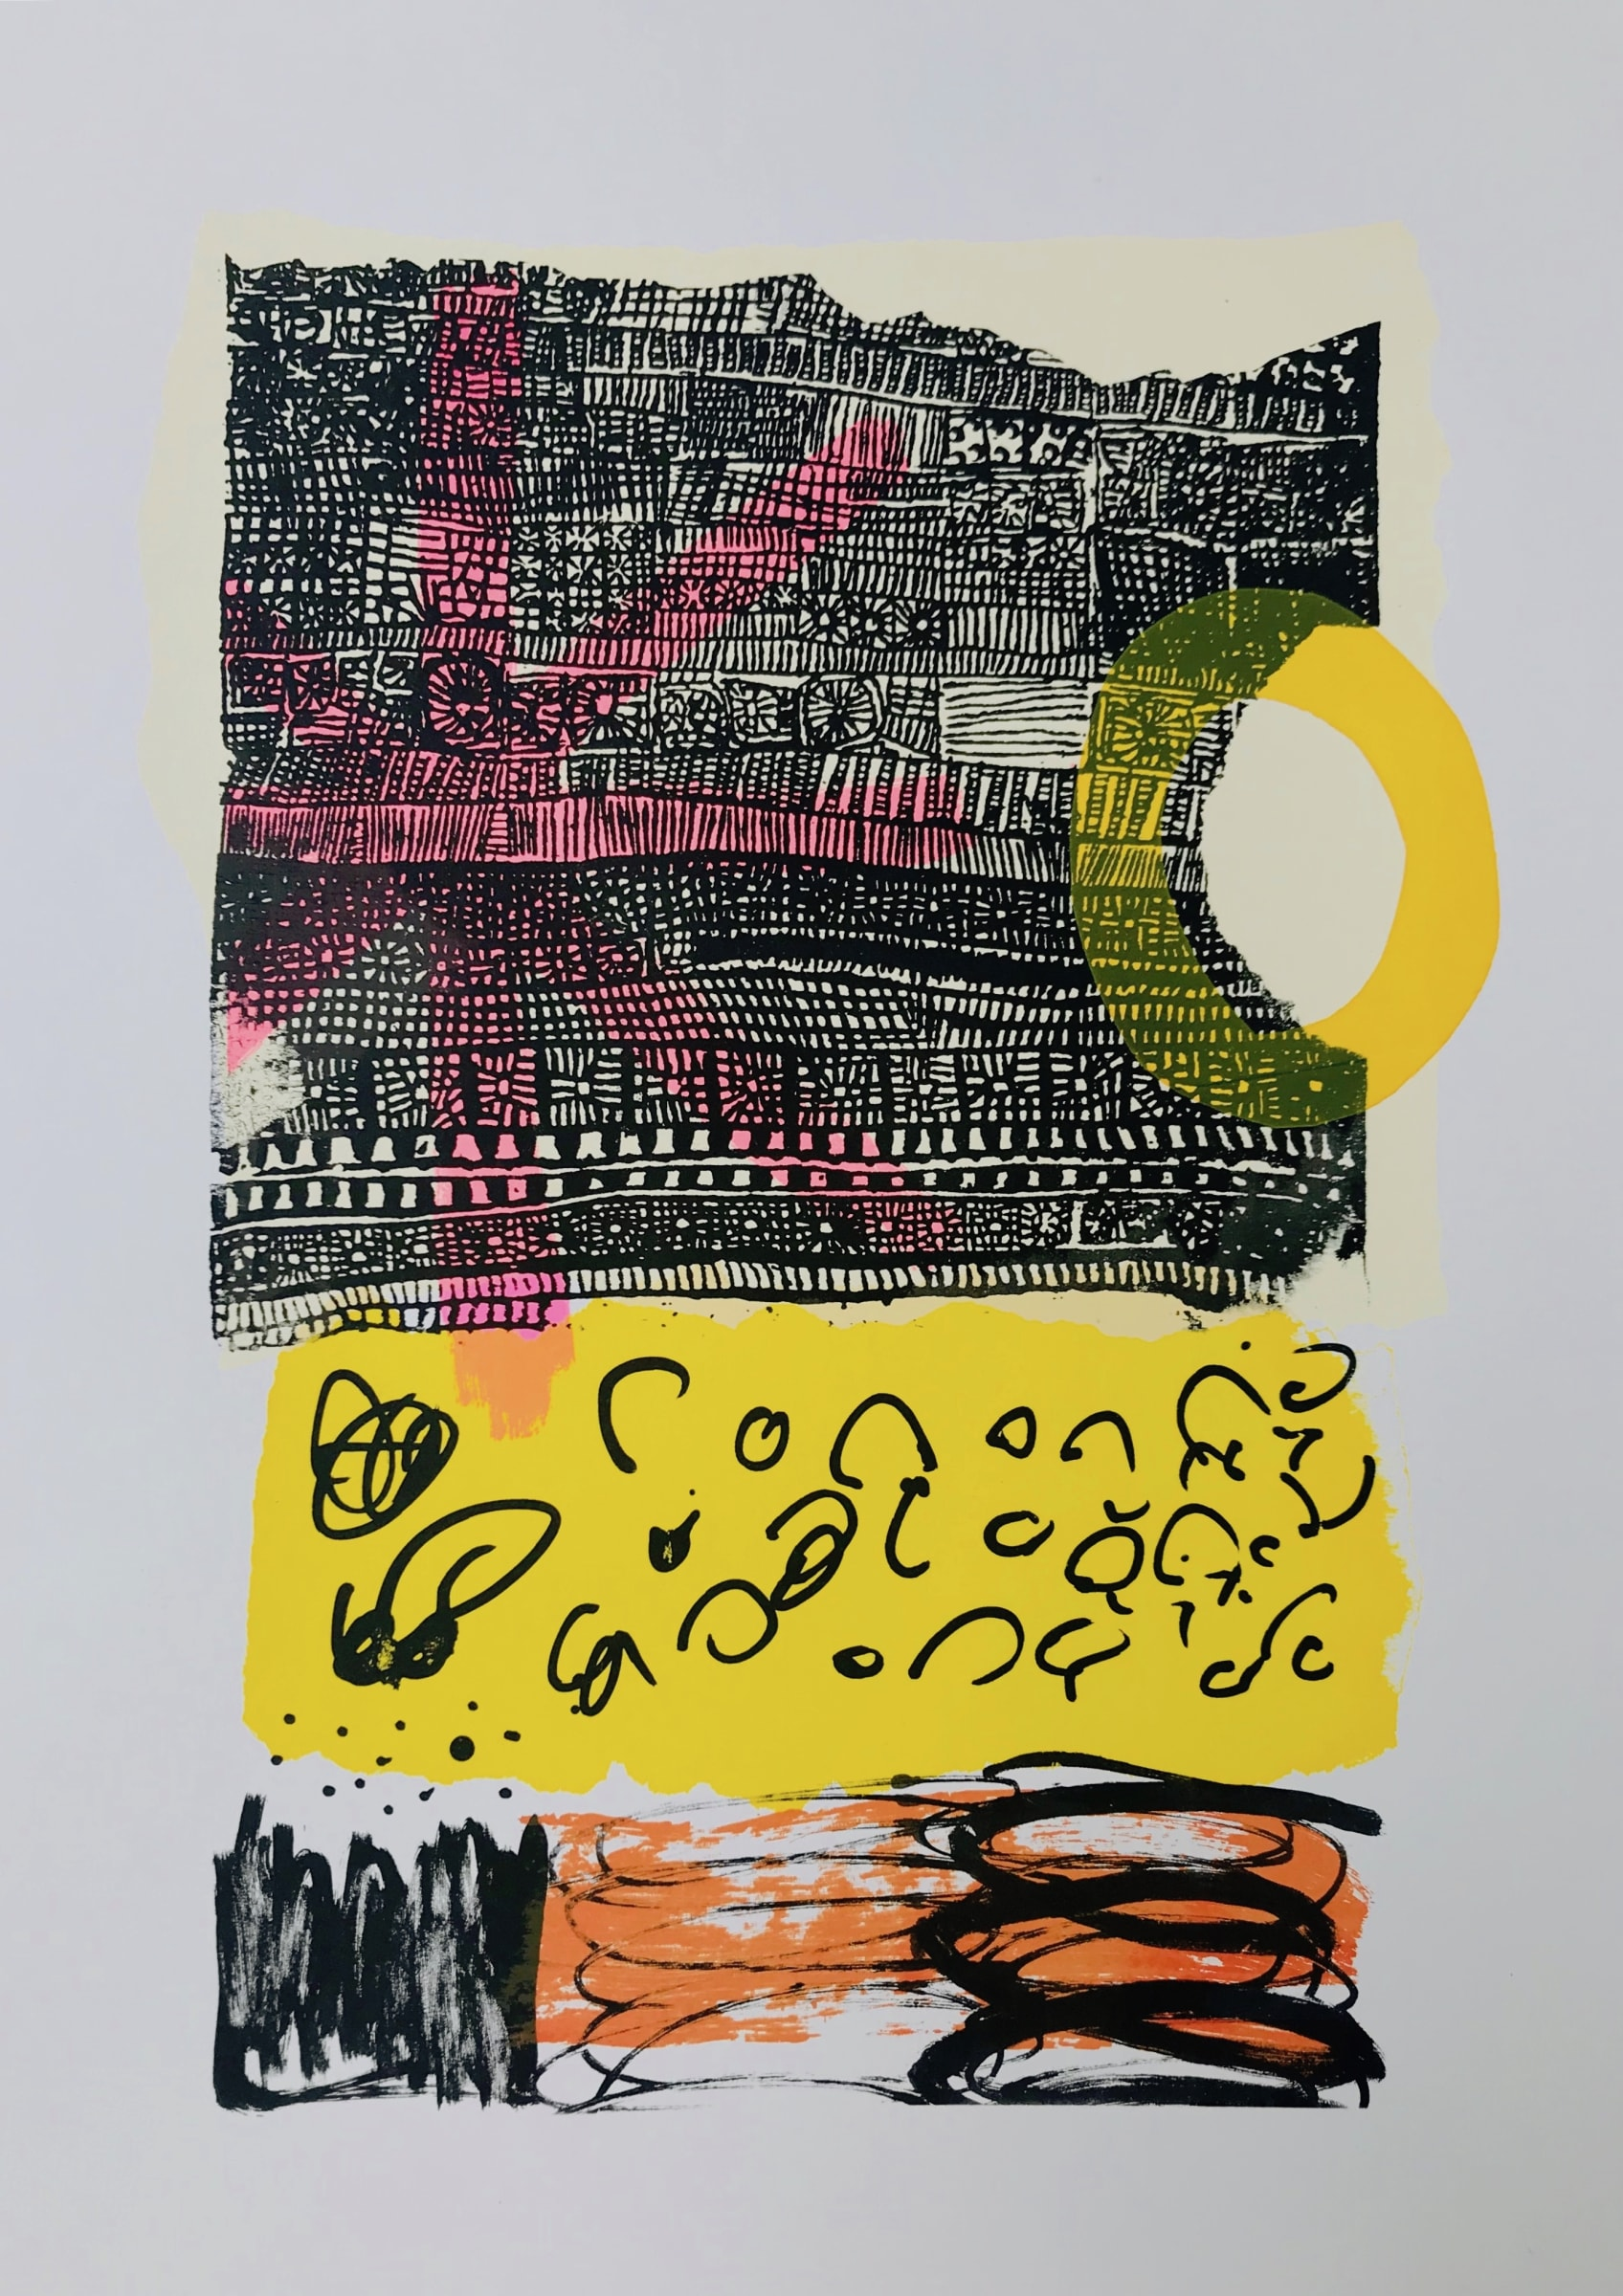 "<span class=""link fancybox-details-link""><a href=""/artists/235-suzanne-bethell/works/6670-suzanne-bethell-jazz/"">View Detail Page</a></span><div class=""artist""><strong>Suzanne Bethell</strong></div> <div class=""title""><em>Jazz</em></div> <div class=""medium"">Mono colour screen print</div> <div class=""dimensions"">30x43cm (unframed), 47x62cm (framed)</div><div class=""price"">£385.00</div><div class=""copyright_line"">Copyright The Artist</div>"